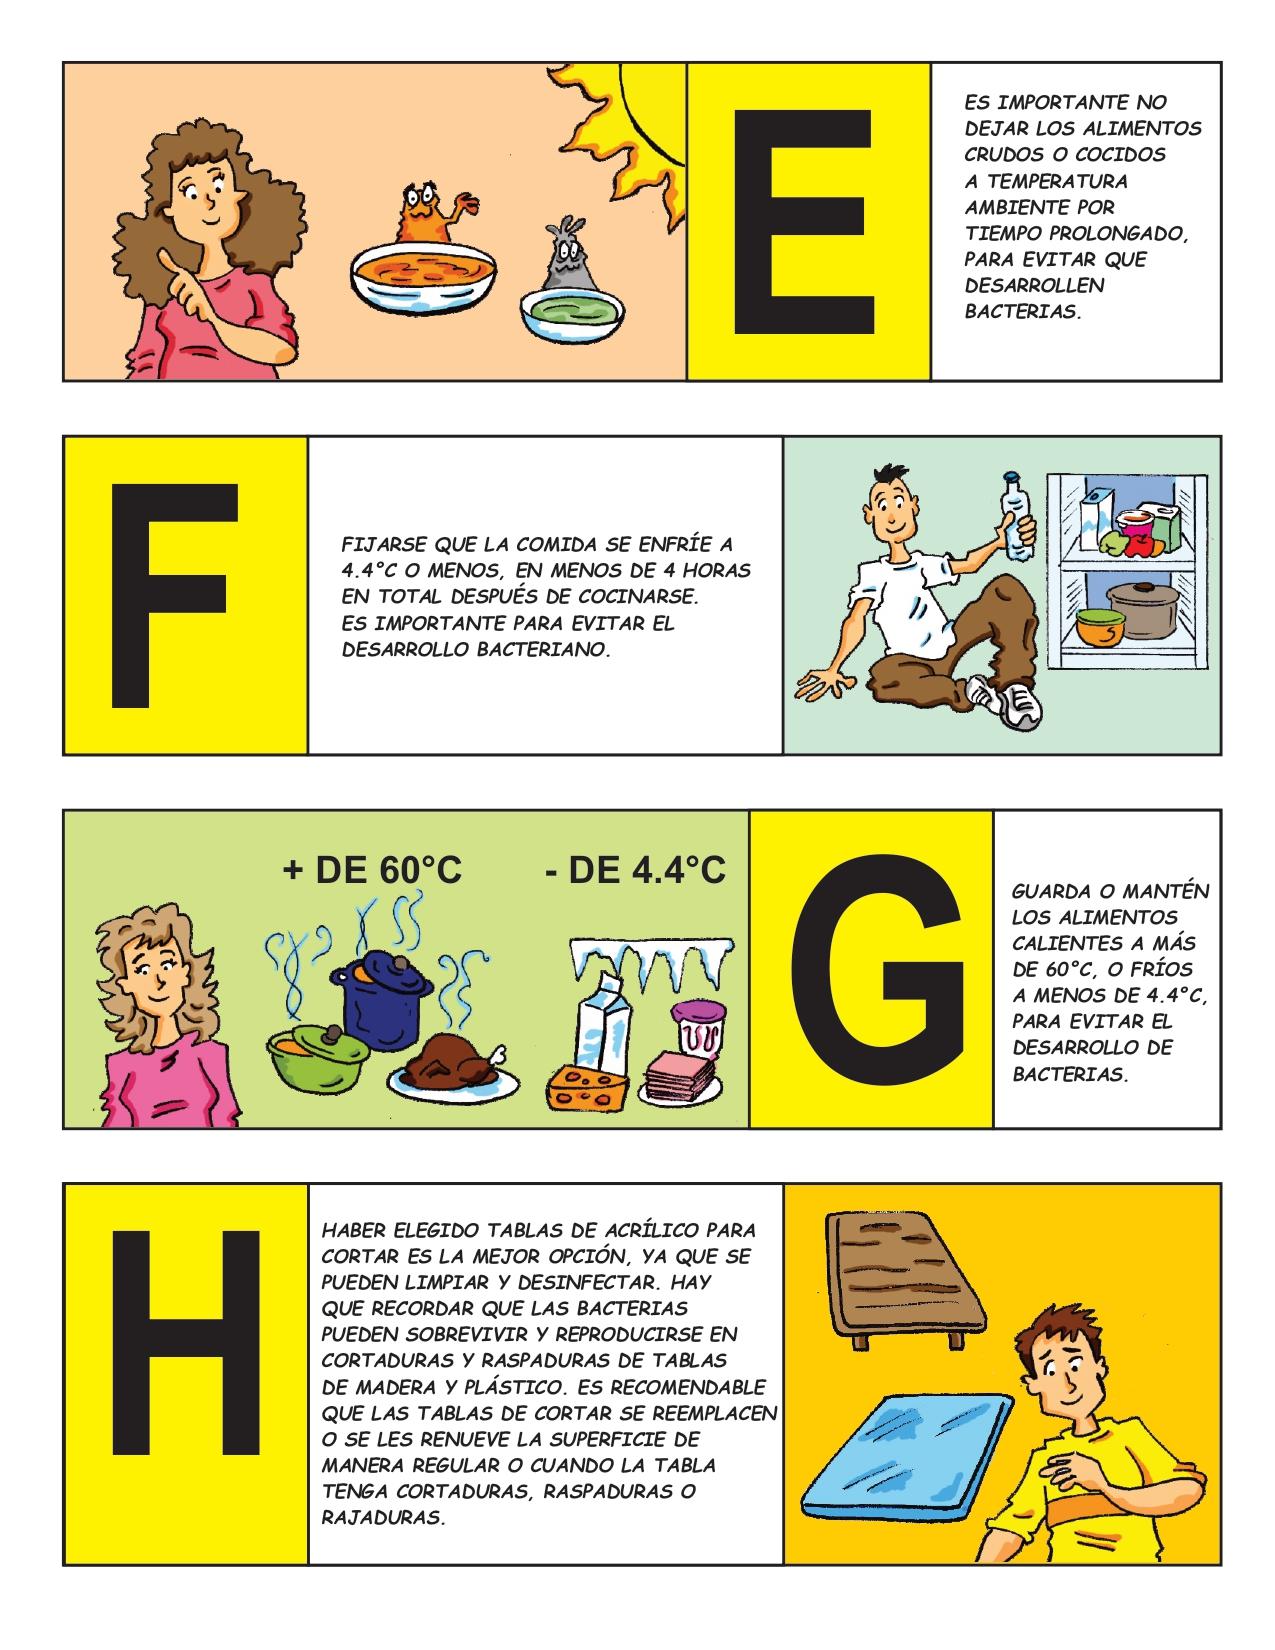 ABC higiene de alimentos digital_page-0004